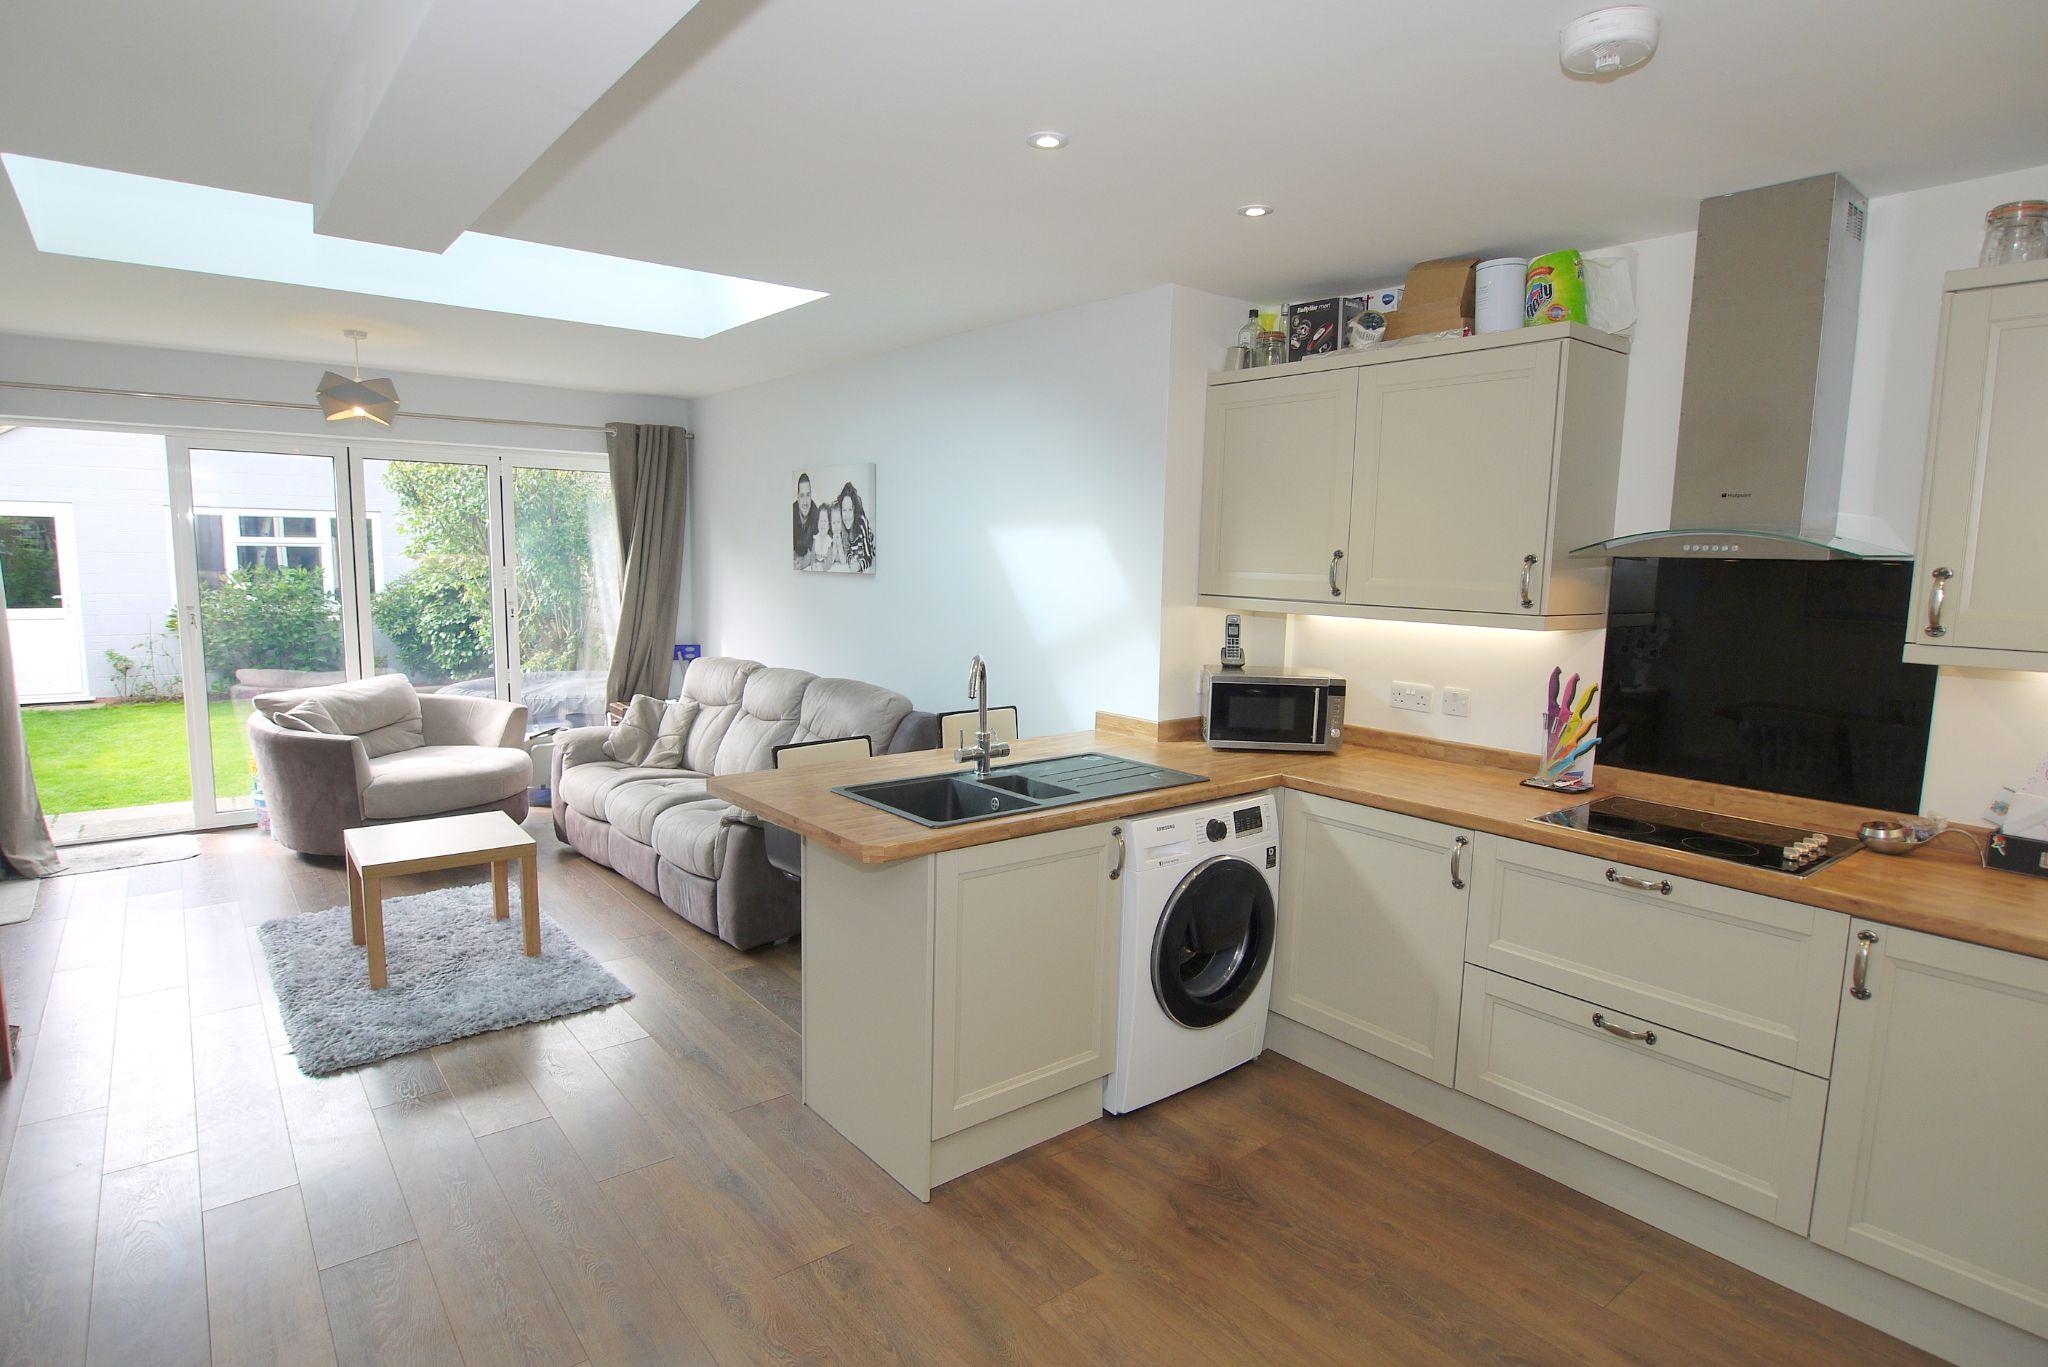 3 bedroom mid terraced house For Sale in Sevenoaks - Photograph 2